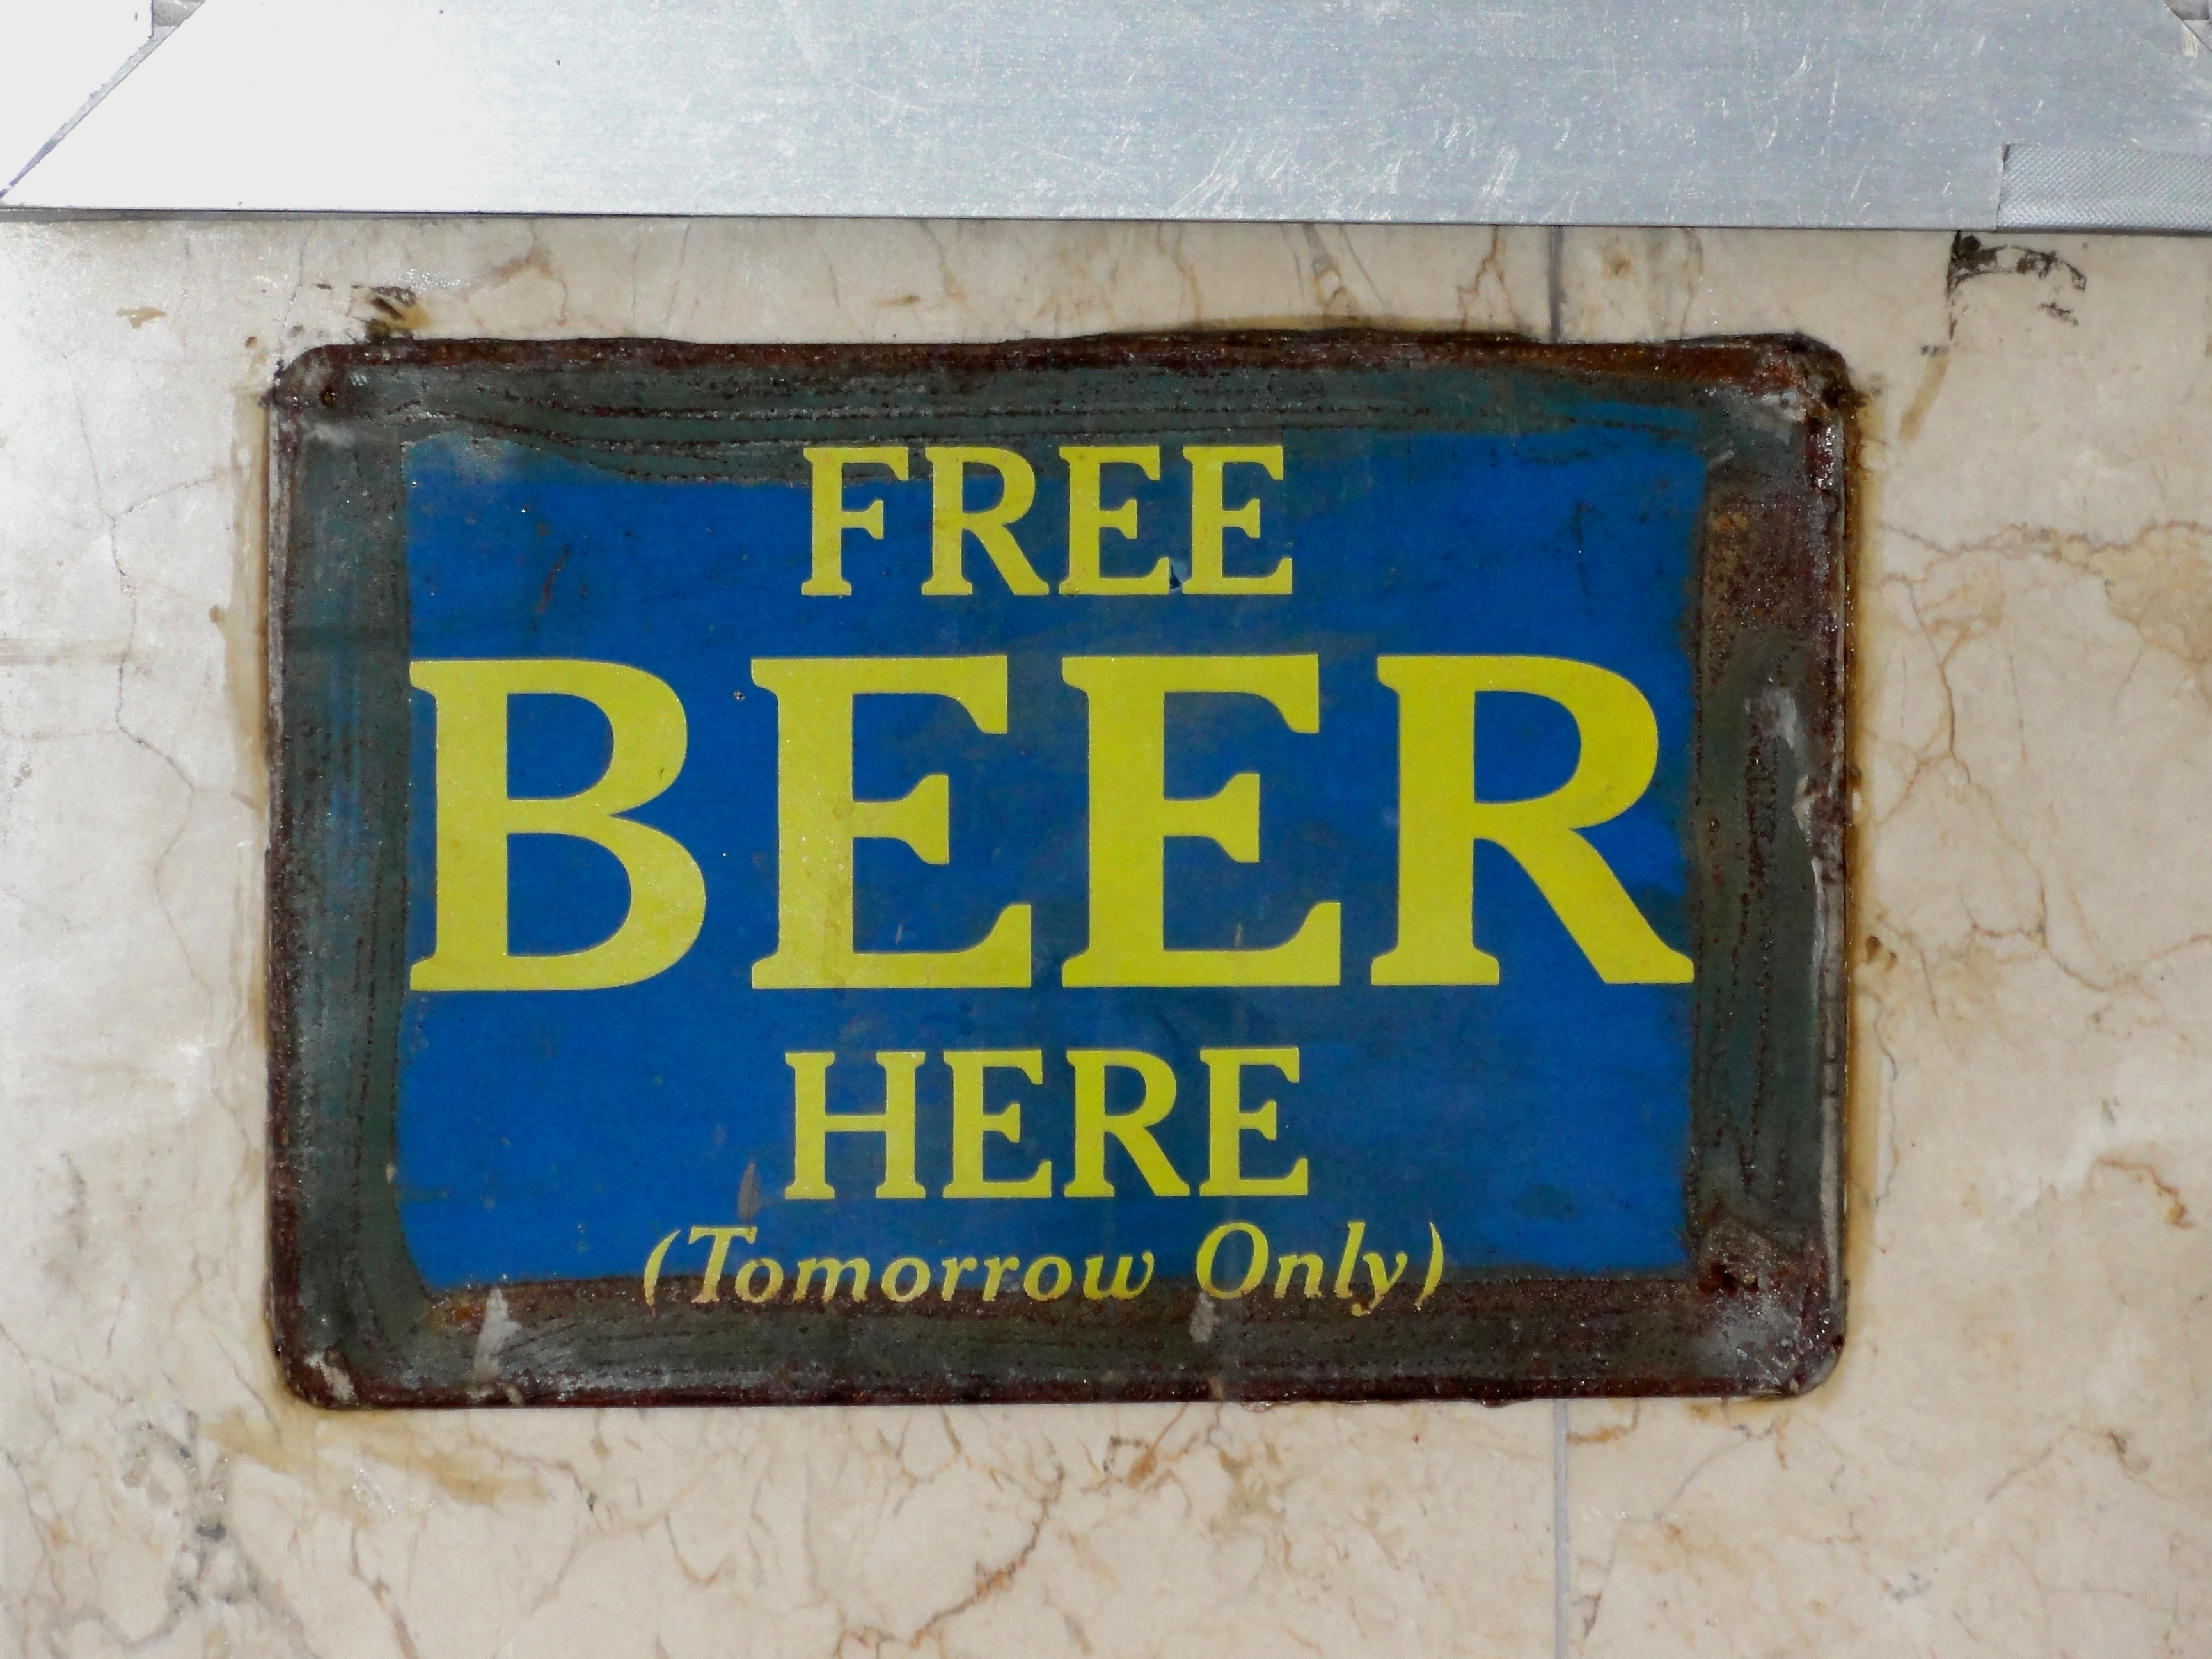 Free Beer. Foto: Tom Morris CC-BY-SA-3.0 via Wikimedia Commons